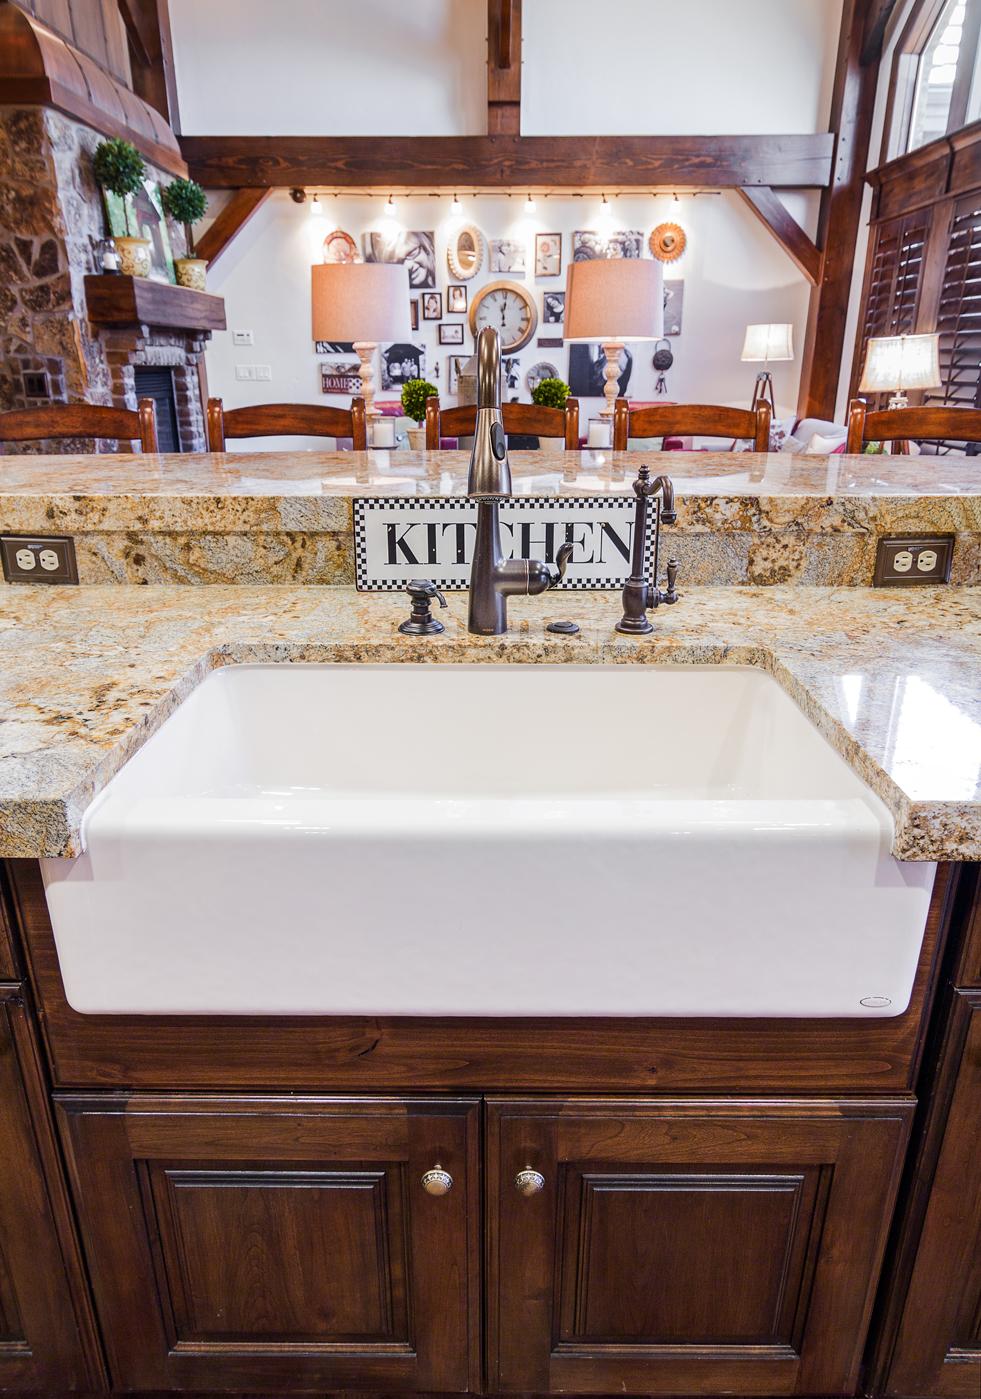 KitchenSink.jpg